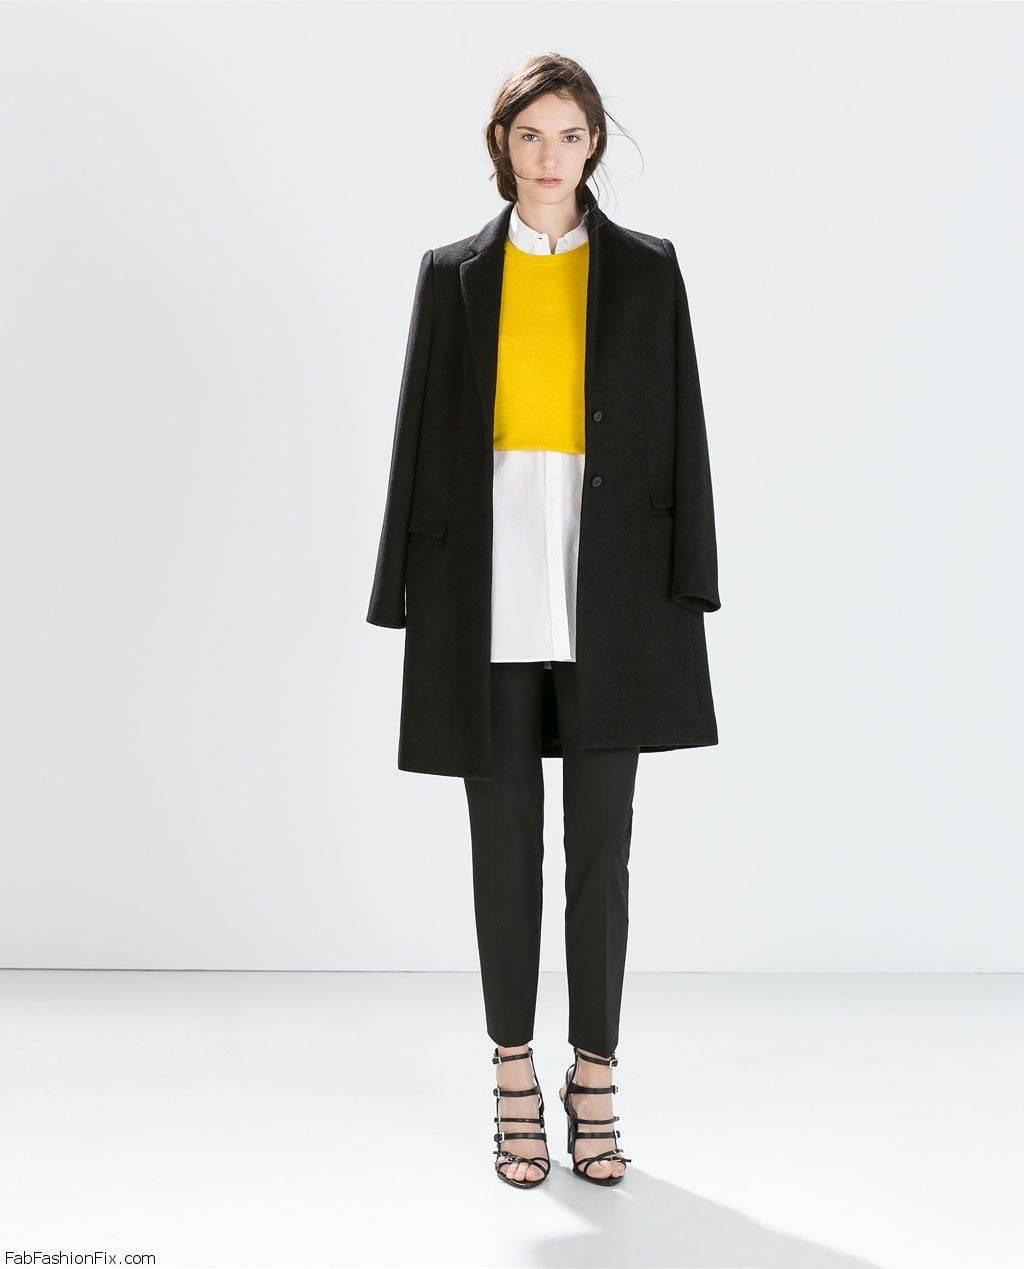 ZARA coats & jackets for fall/winter 2014 | Fab Fashion Fix